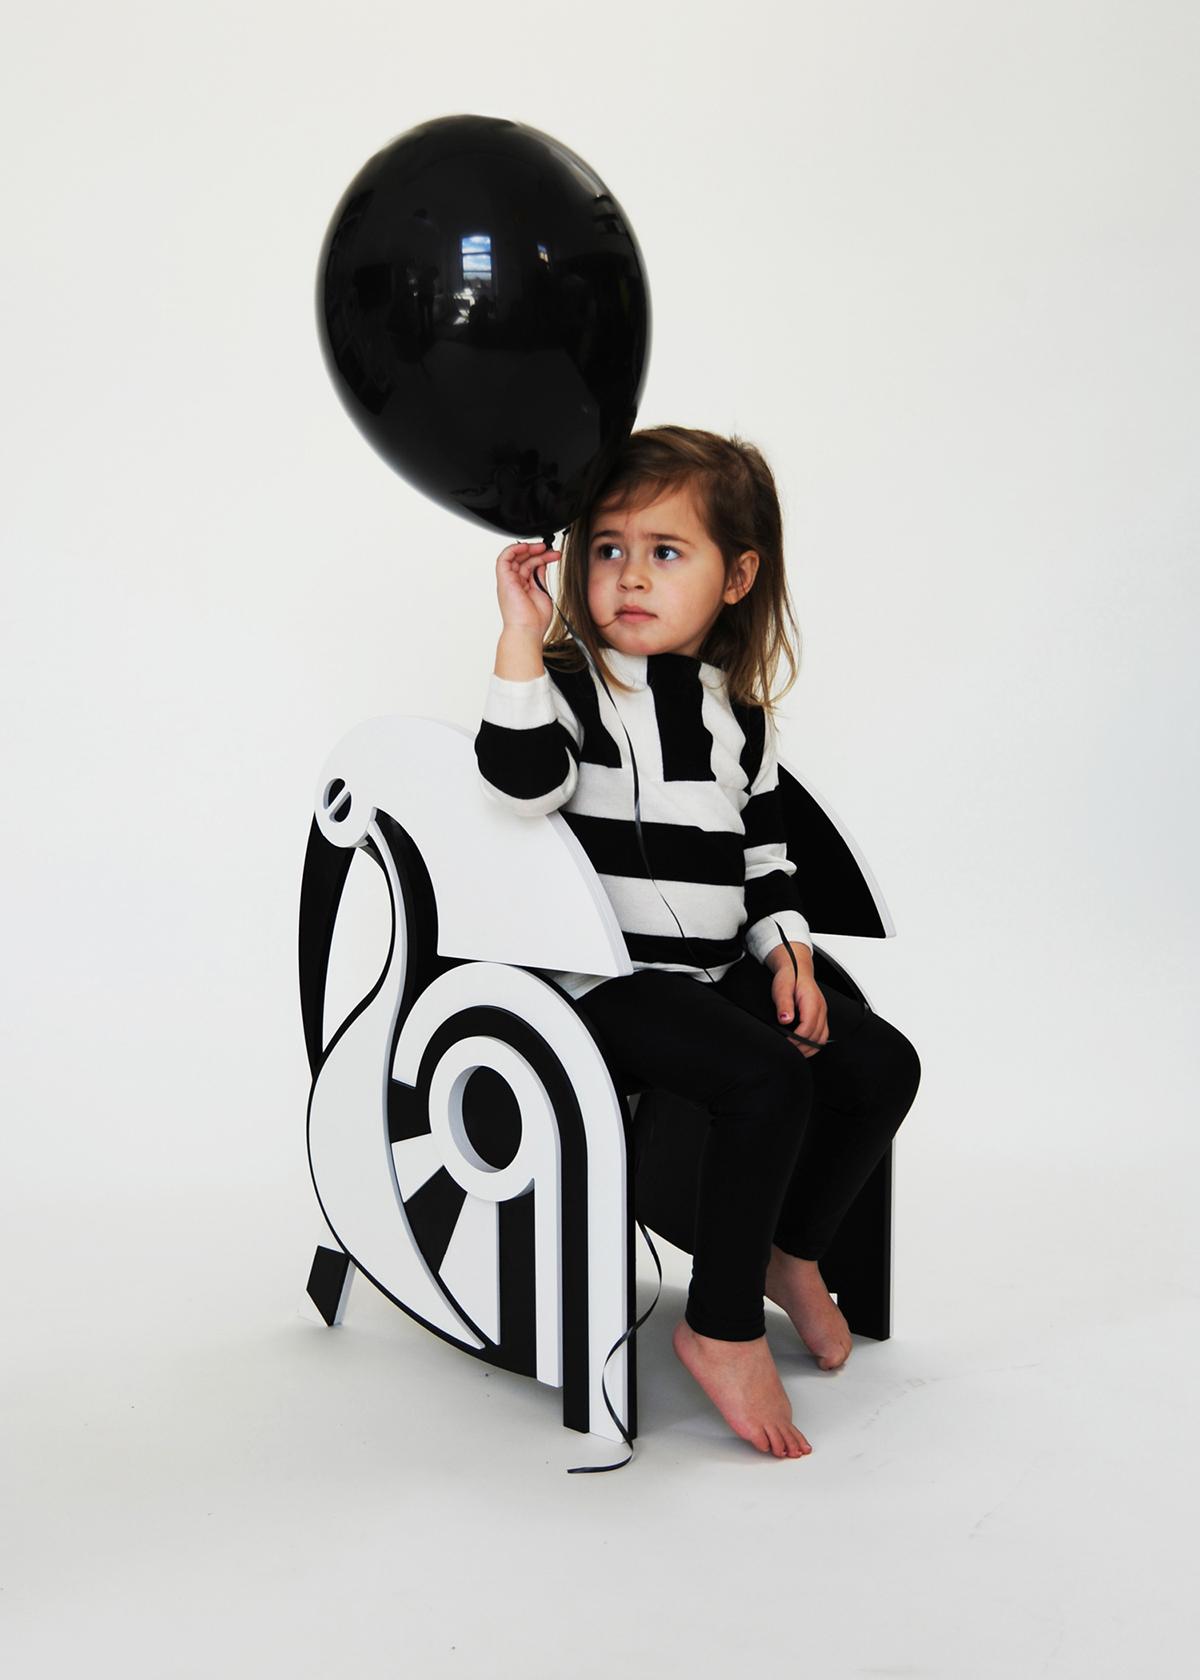 Crawl-chair-Materiallust-New-York-Design-Week-Collective-Childrens-Furniture-6.jpg